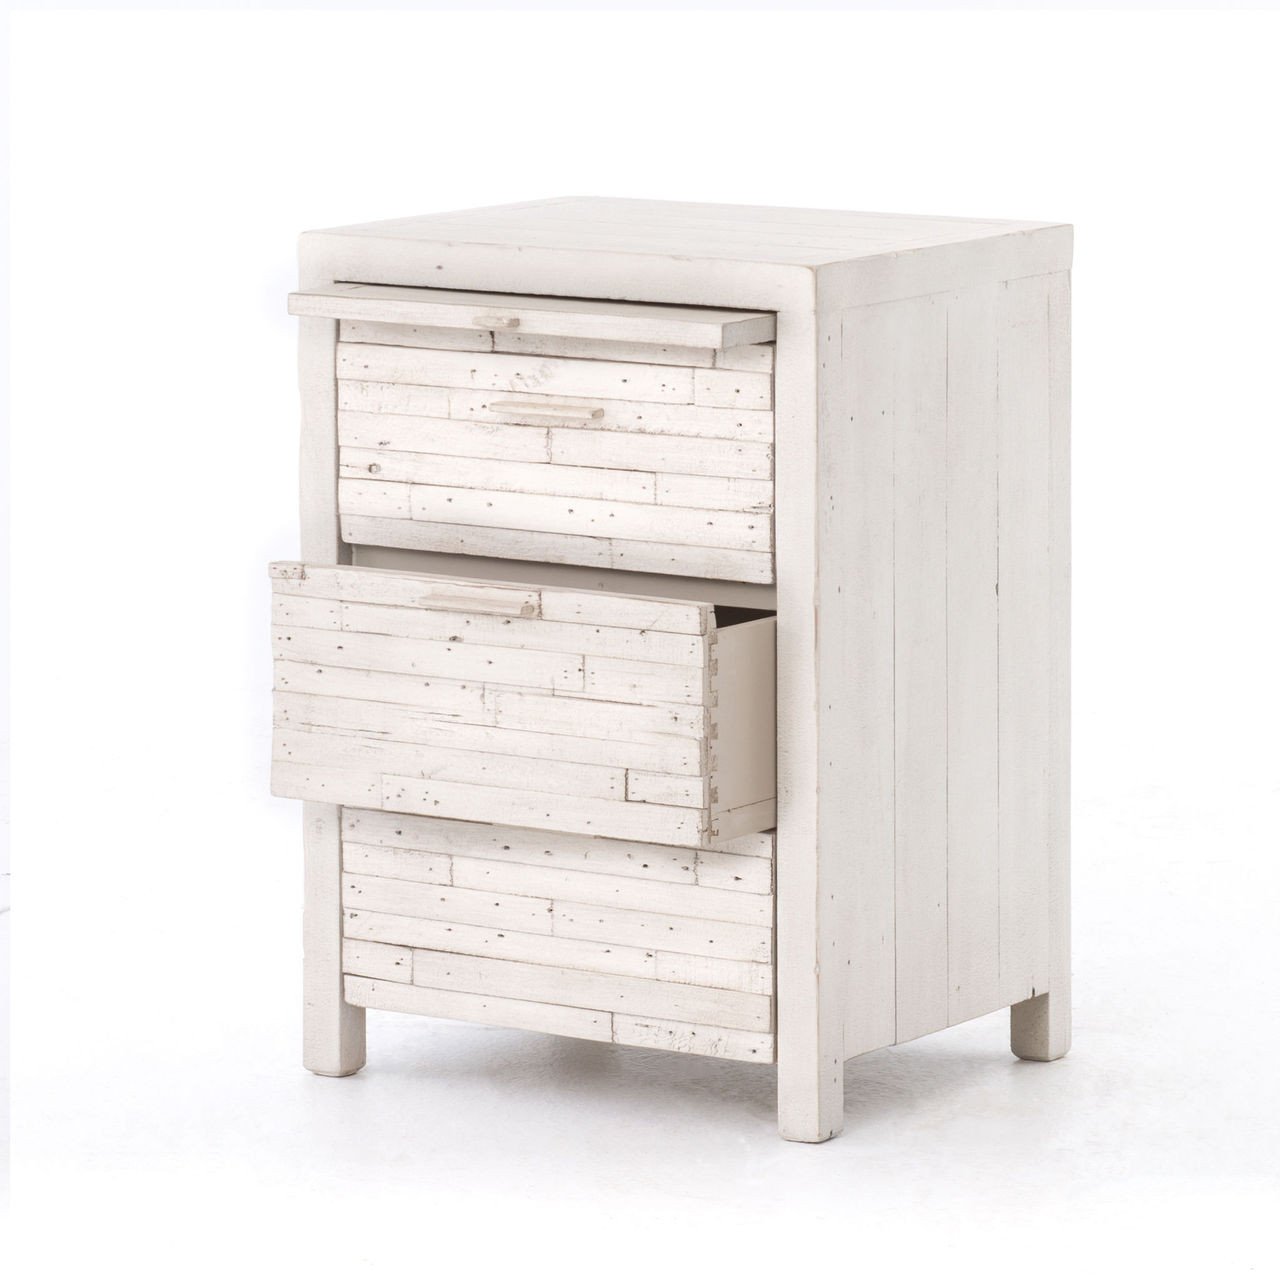 Coastal Reclaimed Wood White 3 Drawer Nightstand